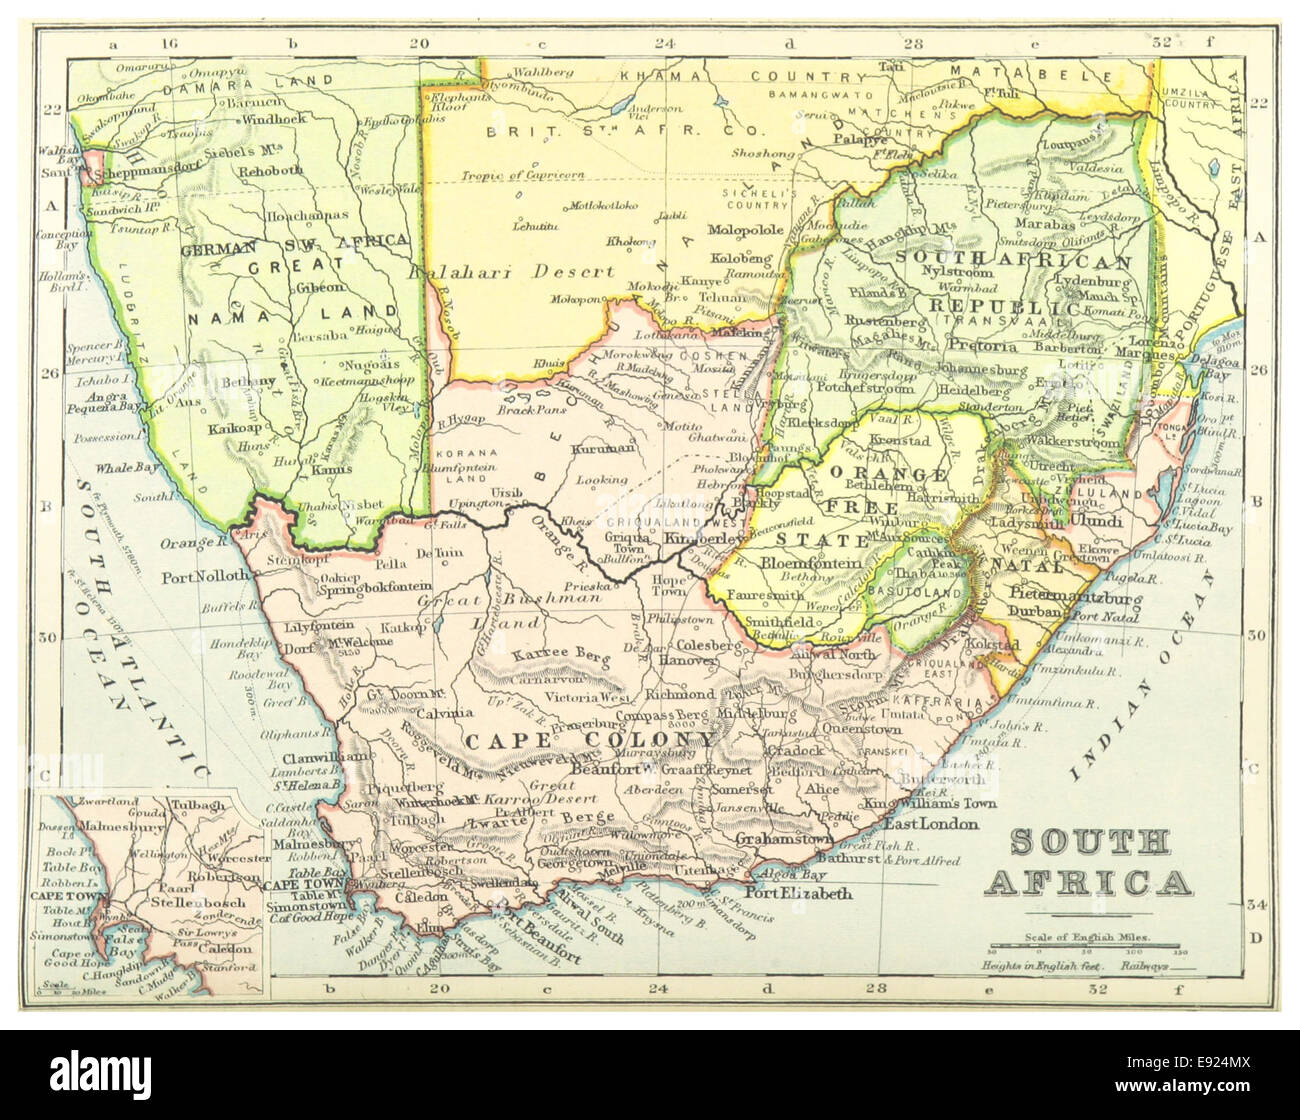 Cartina Sud Africa Da Stampare.Mappa Del Sud Africa Immagini E Fotos Stock Alamy